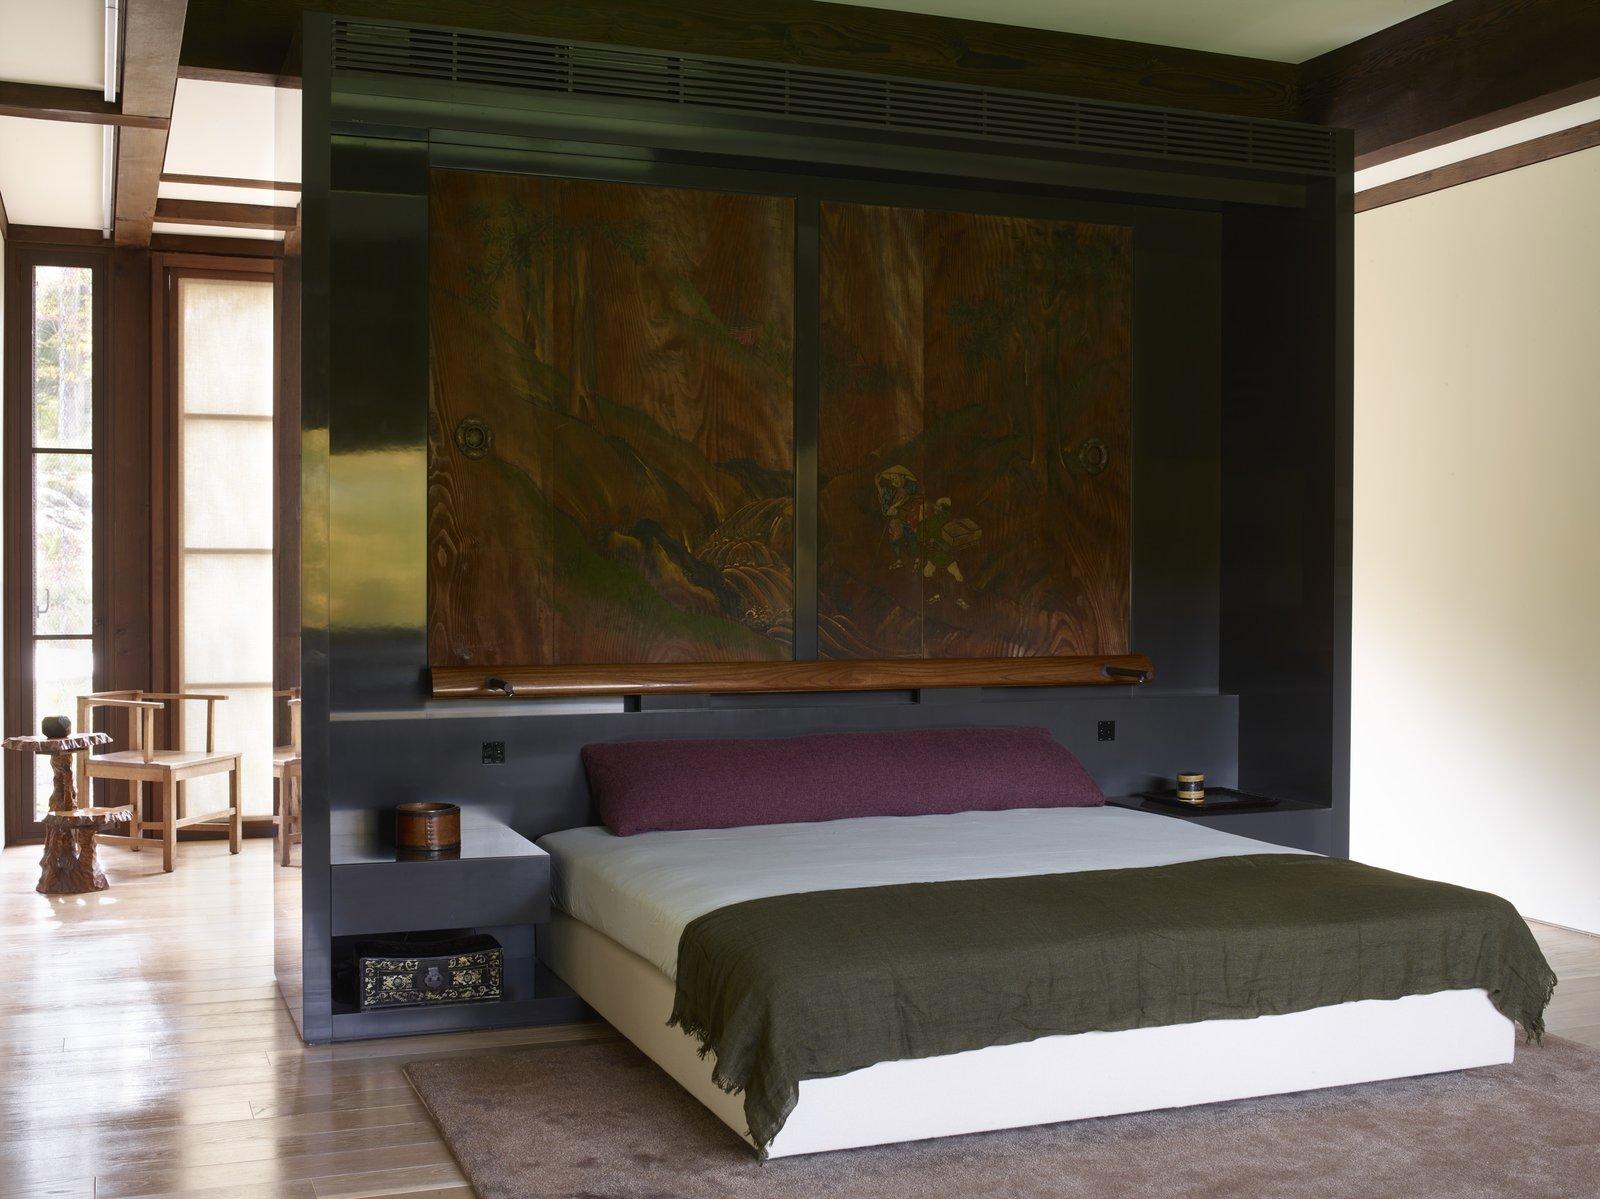 Bedroom, Bed, Medium Hardwood Floor, Rug Floor, and Night Stands  Photo 12 of 15 in Feast Your Eyes on Fashion Designer Josie Natori's Japanese-Inspired Home